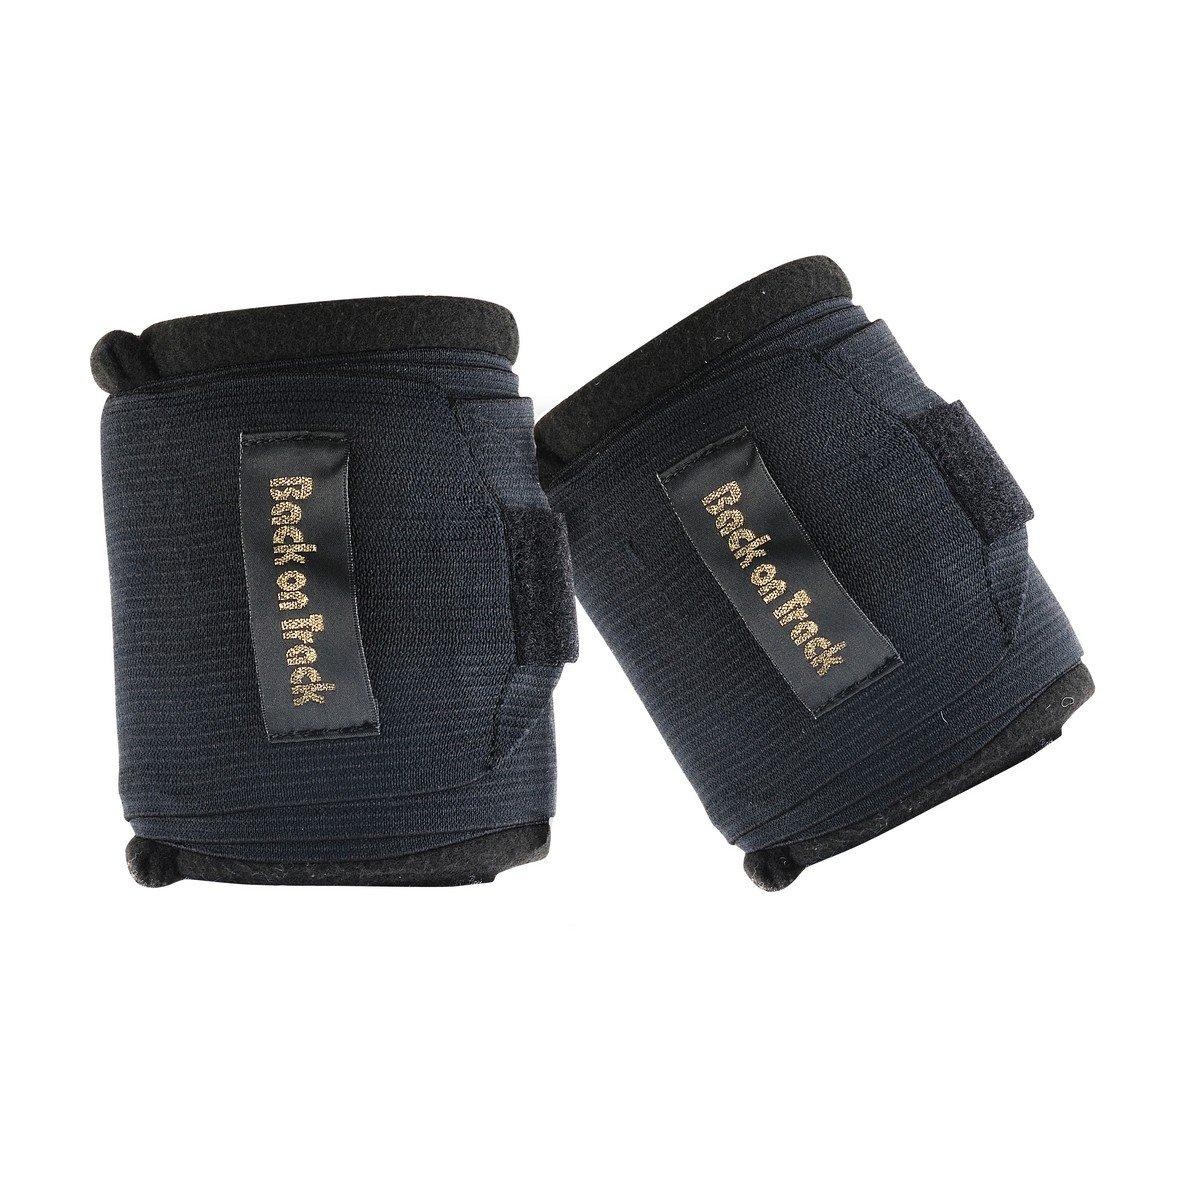 Afbeelding van Back on Track Bandages per Paar Combi Bandage Zwart 3